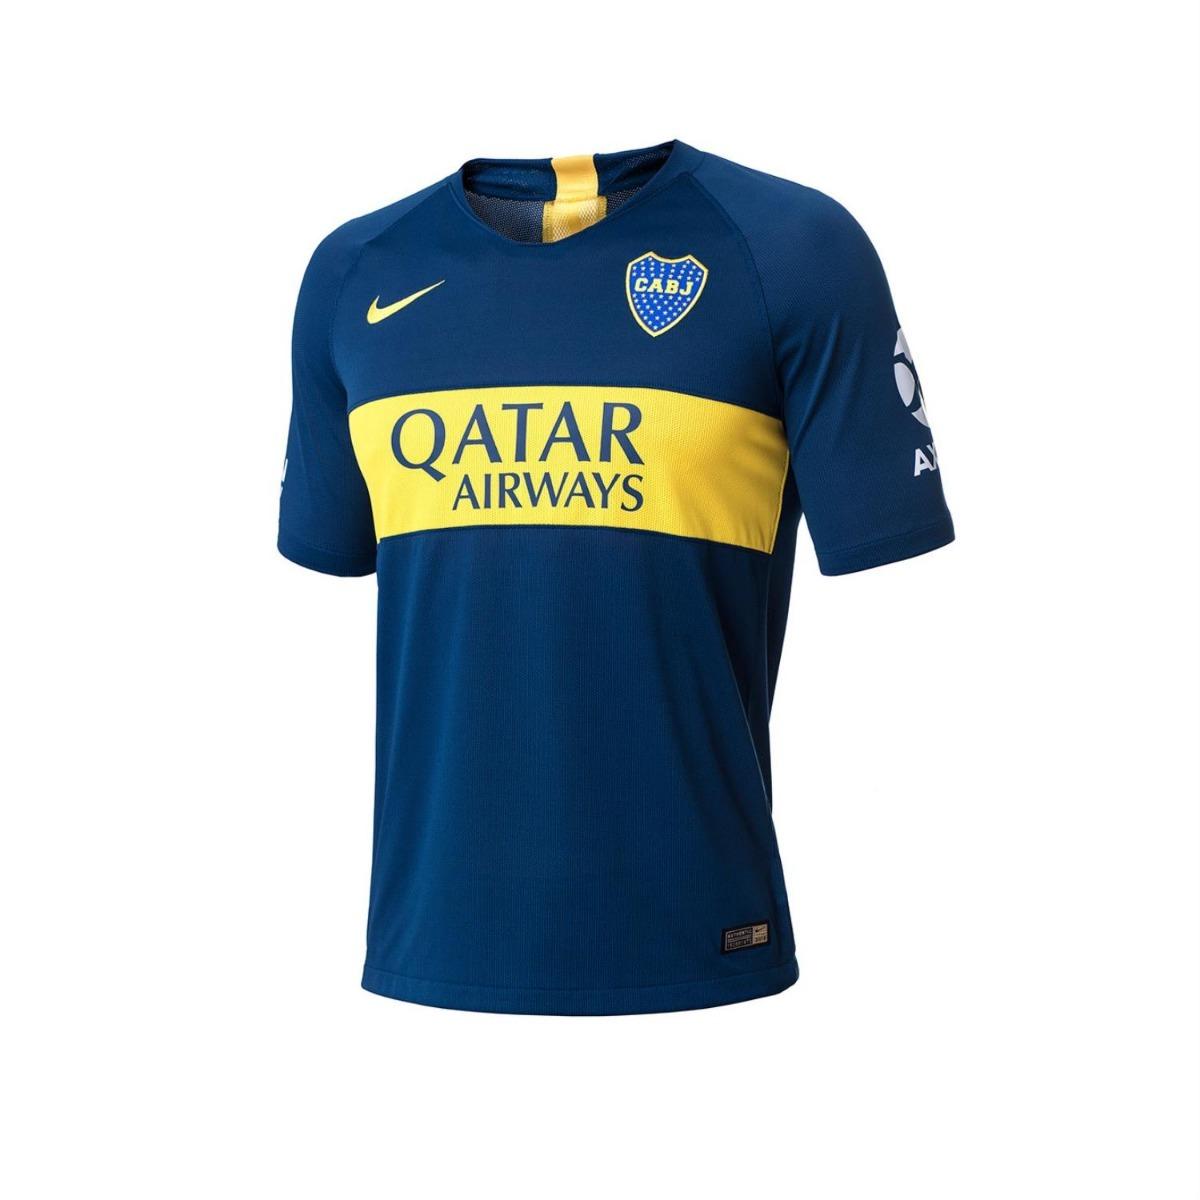 camiseta boca match 2019 tevez pavon benedetto perez oficial. Cargando zoom. 08a23dd336280